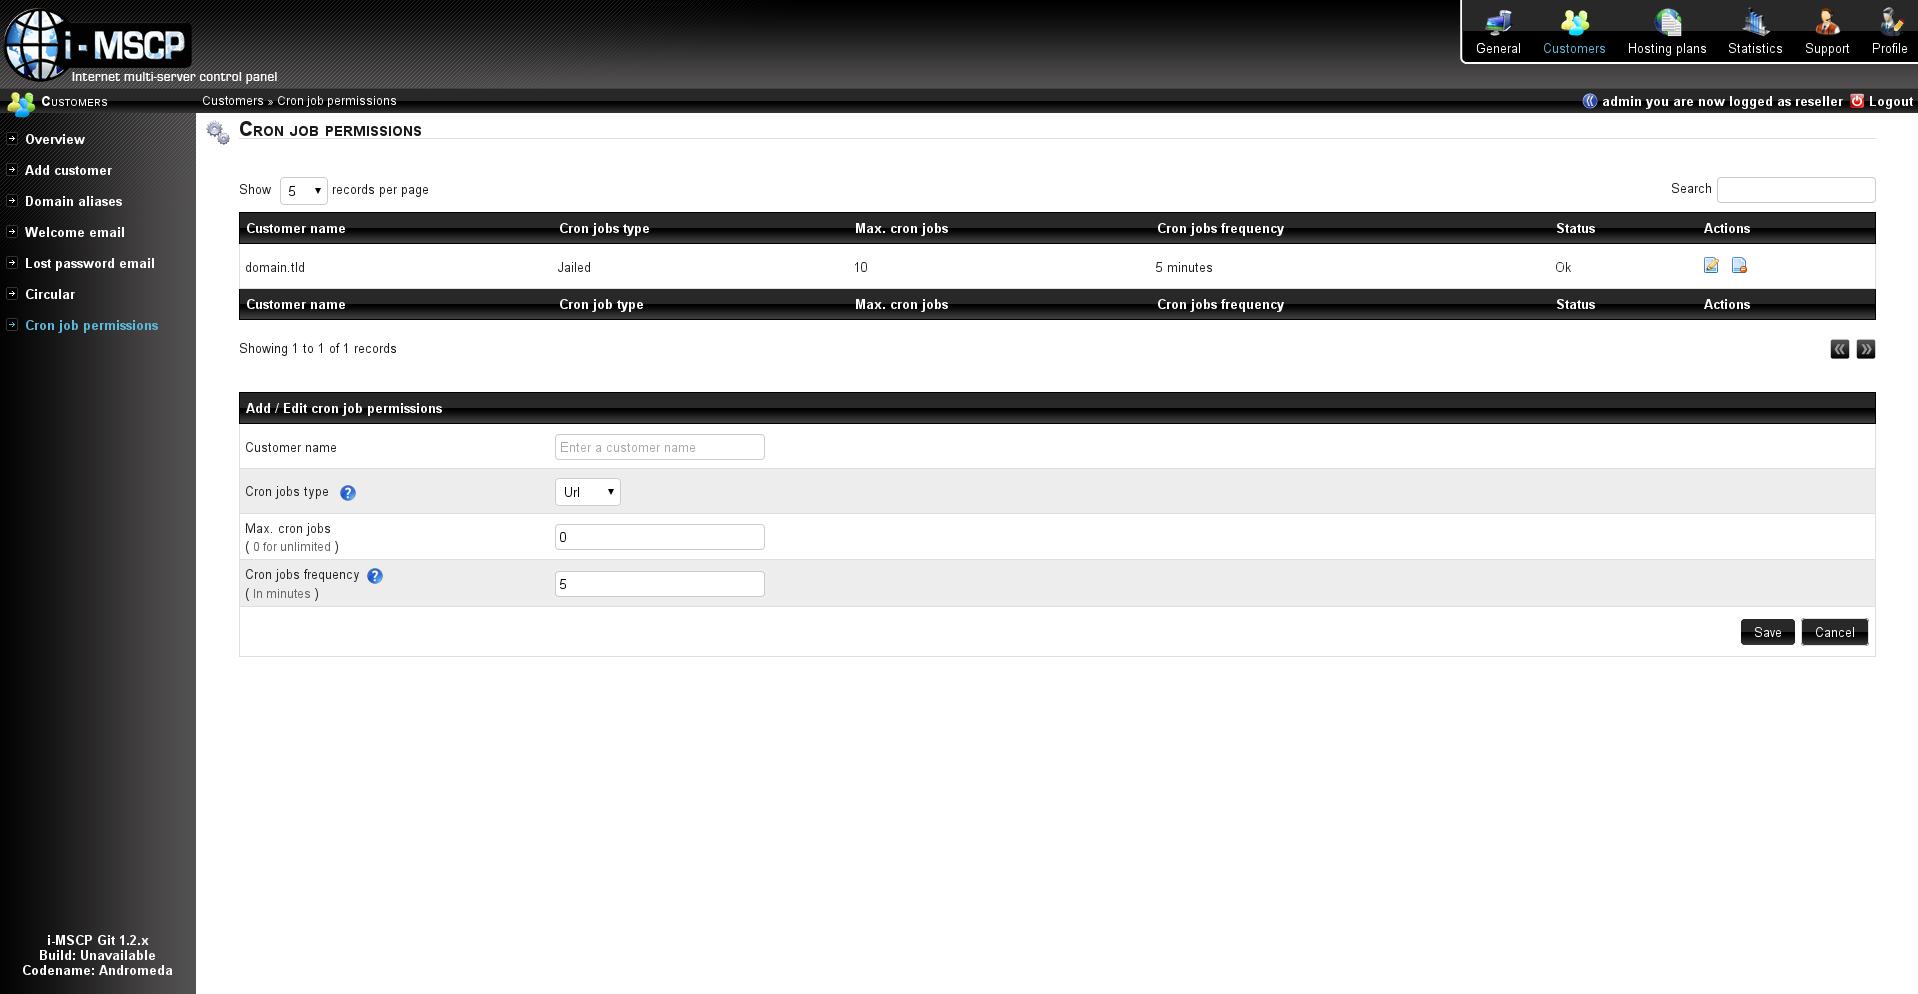 Cronjobs i mscp internet multi server control panel - Internet multi server control panel ...